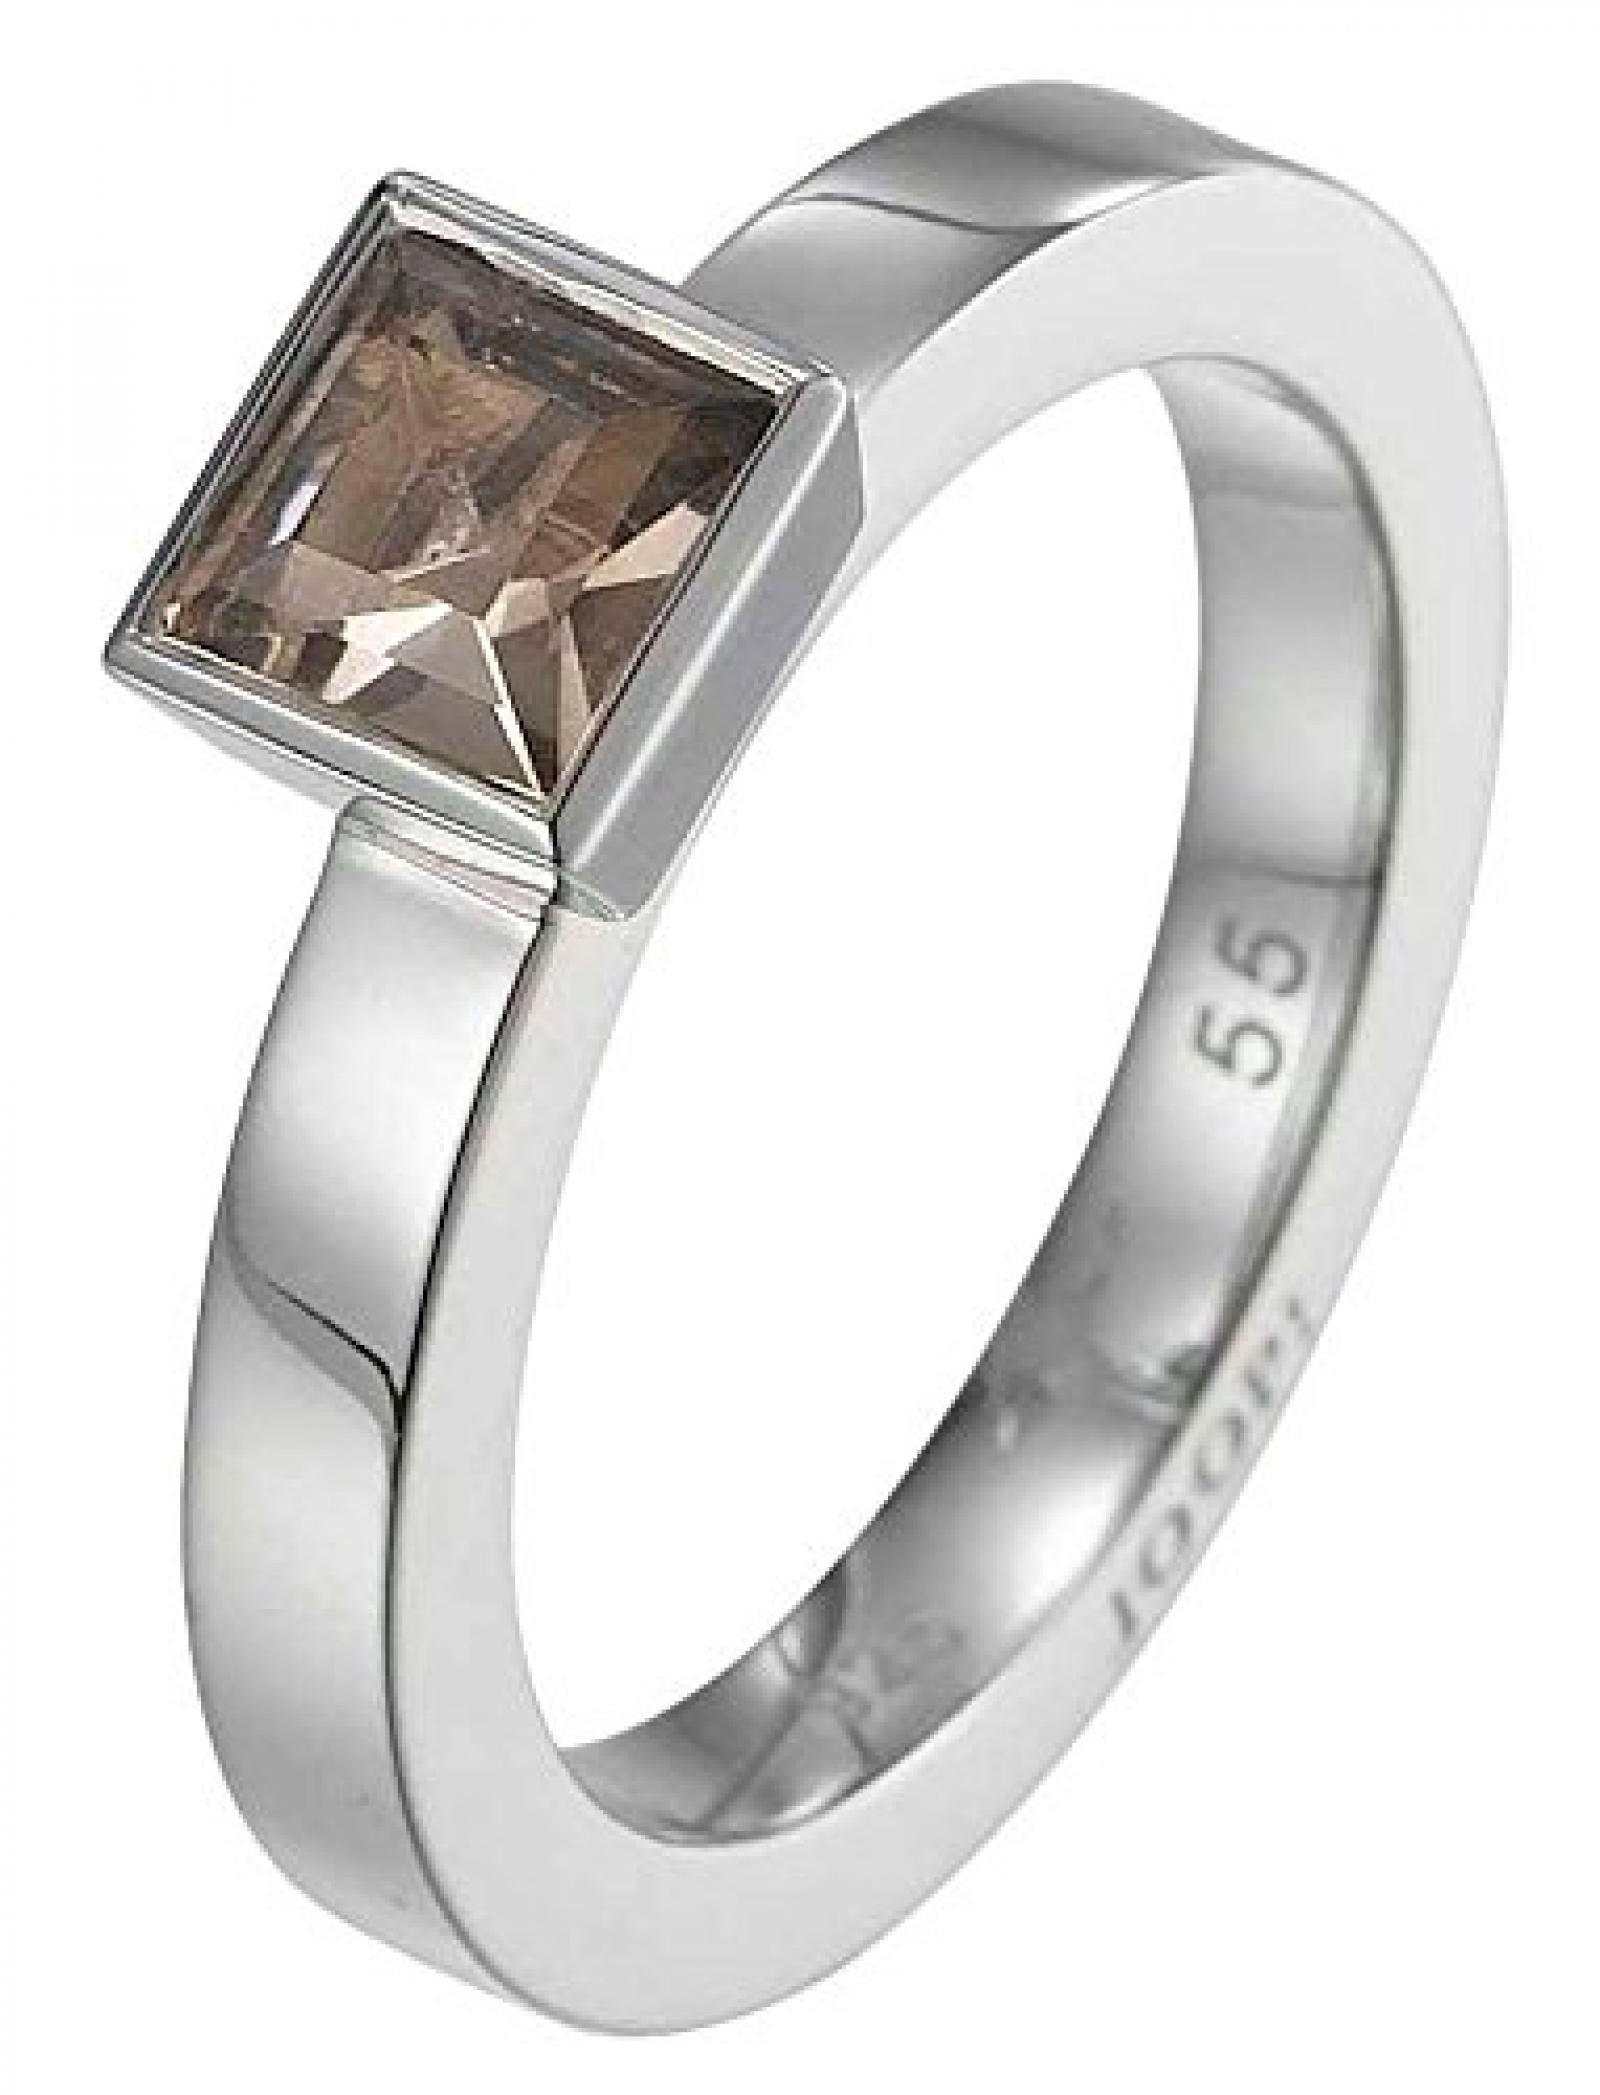 Joop Damen-Ring 925 Sterling Silber rhodiniert Rauchquarz Mia braun Gr.63 (20.1) JPRG90495B630